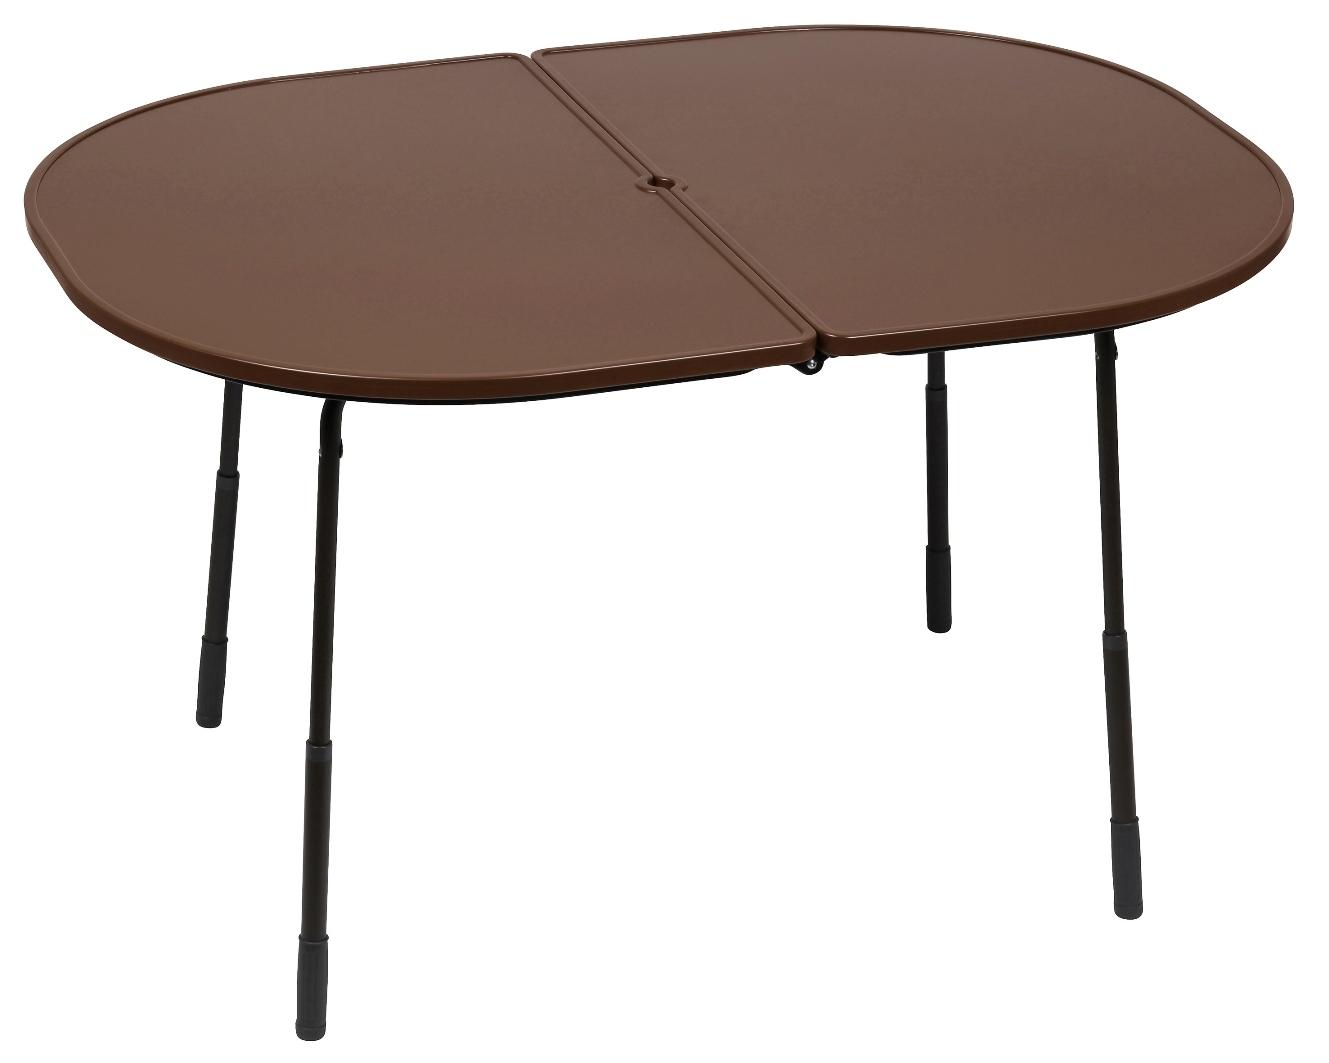 lafuma hawai outdoor table. Black Bedroom Furniture Sets. Home Design Ideas